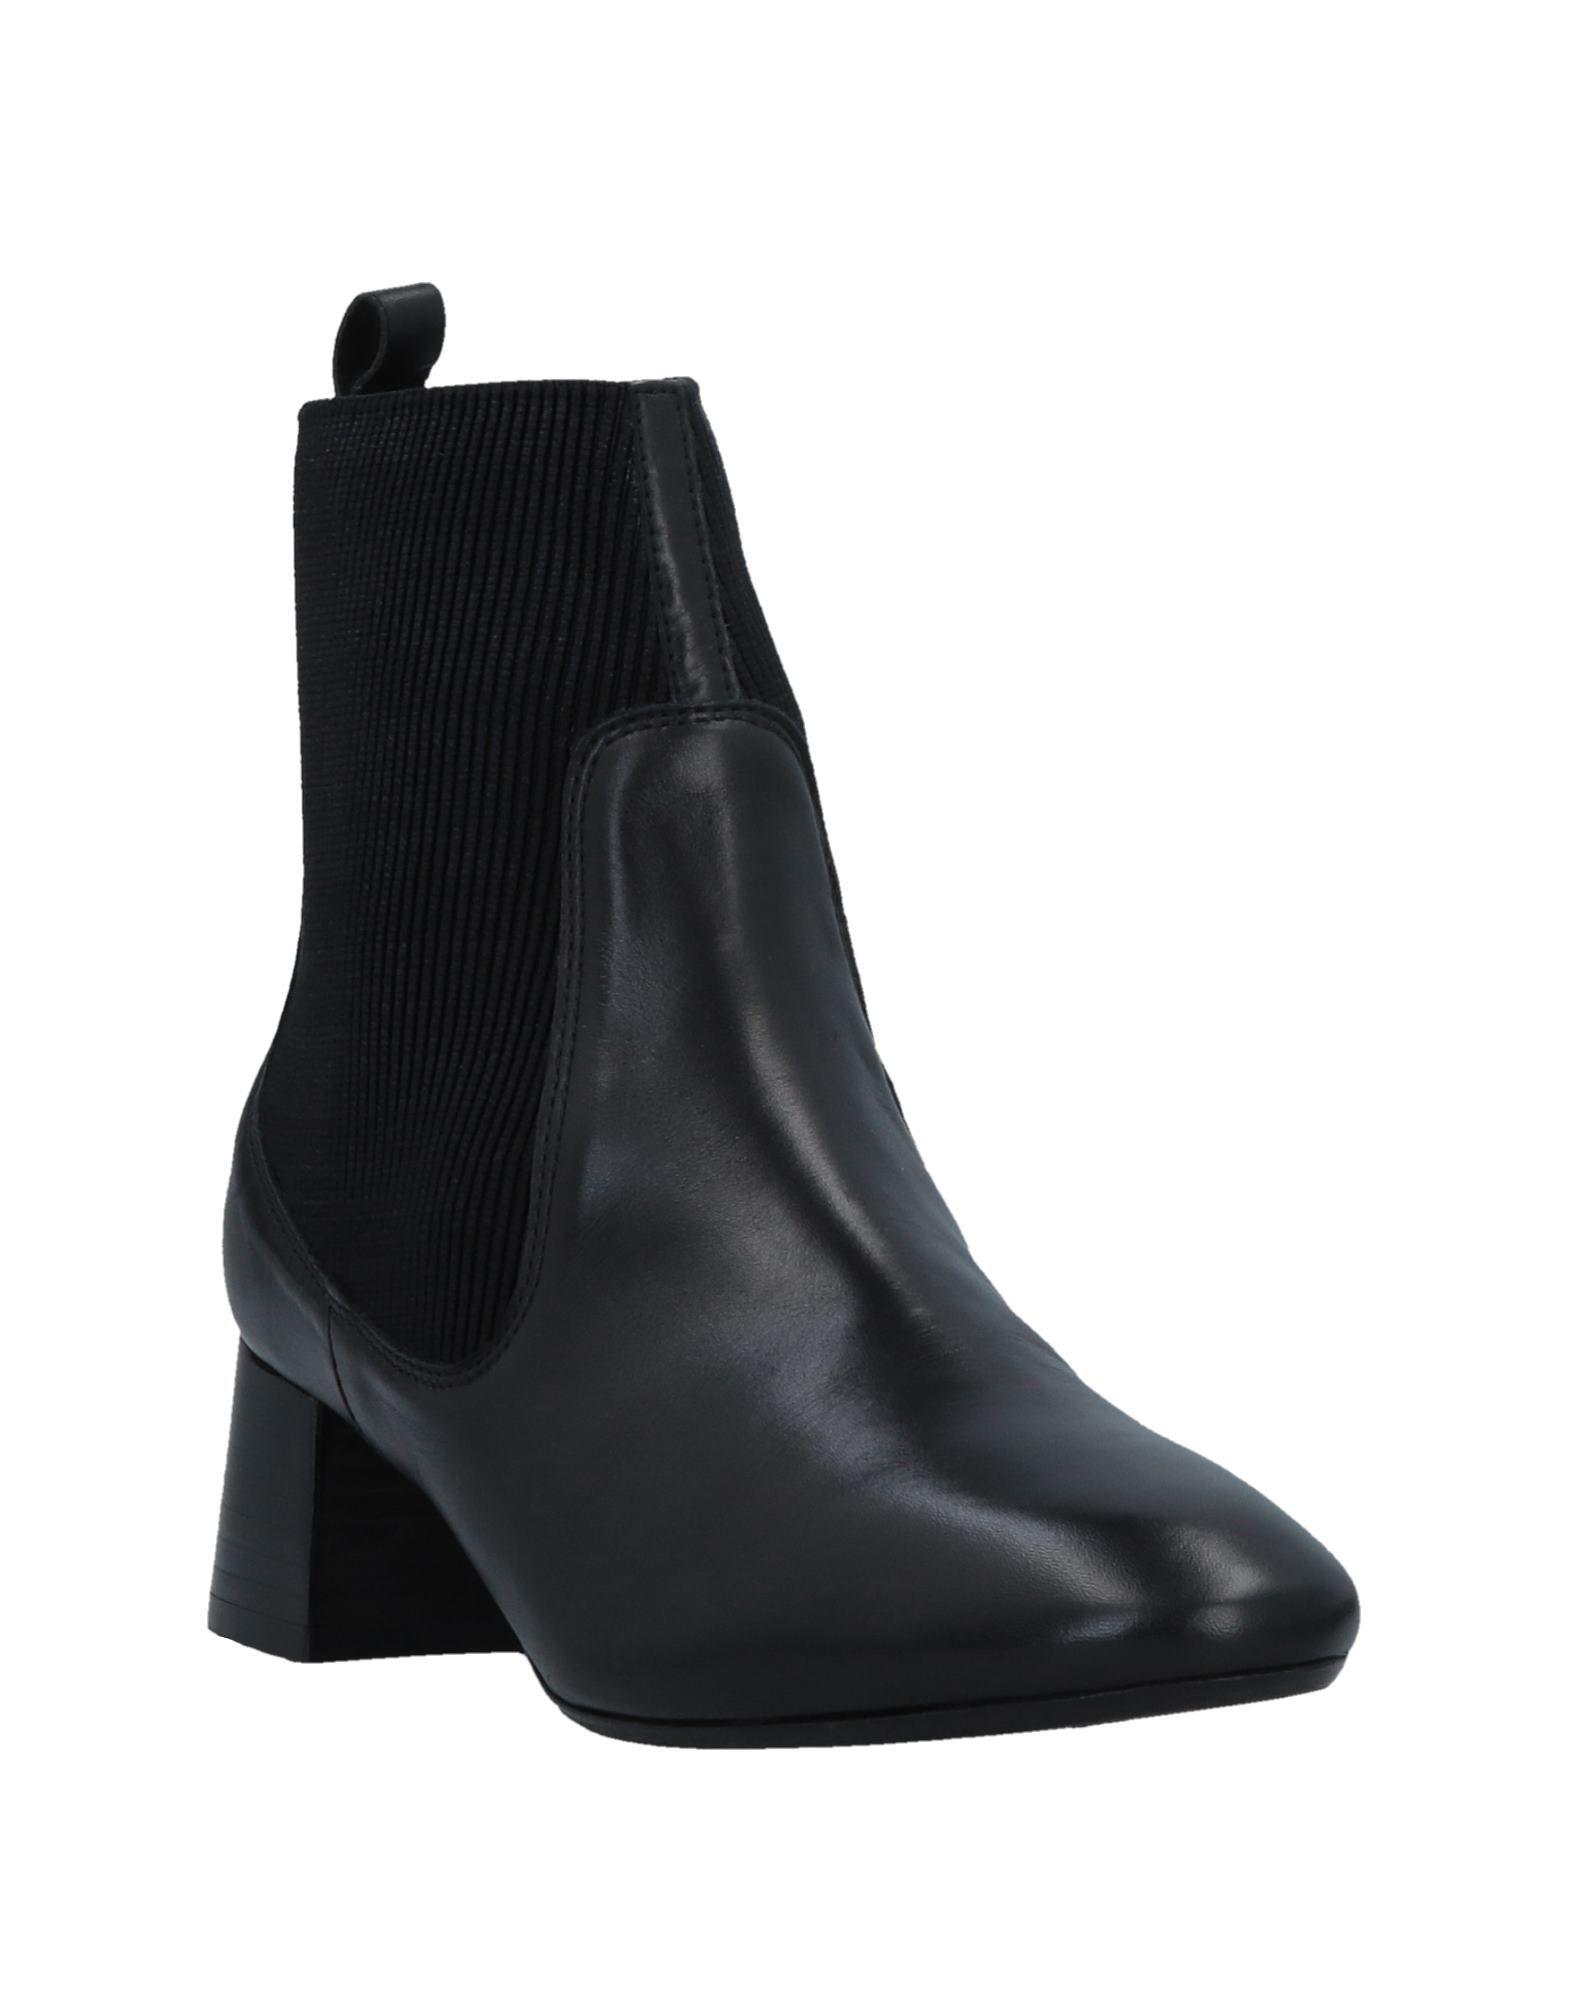 Parlanti Stiefelette strapazierfähige Damen  11504220EOGut aussehende strapazierfähige Stiefelette Schuhe 6a5097